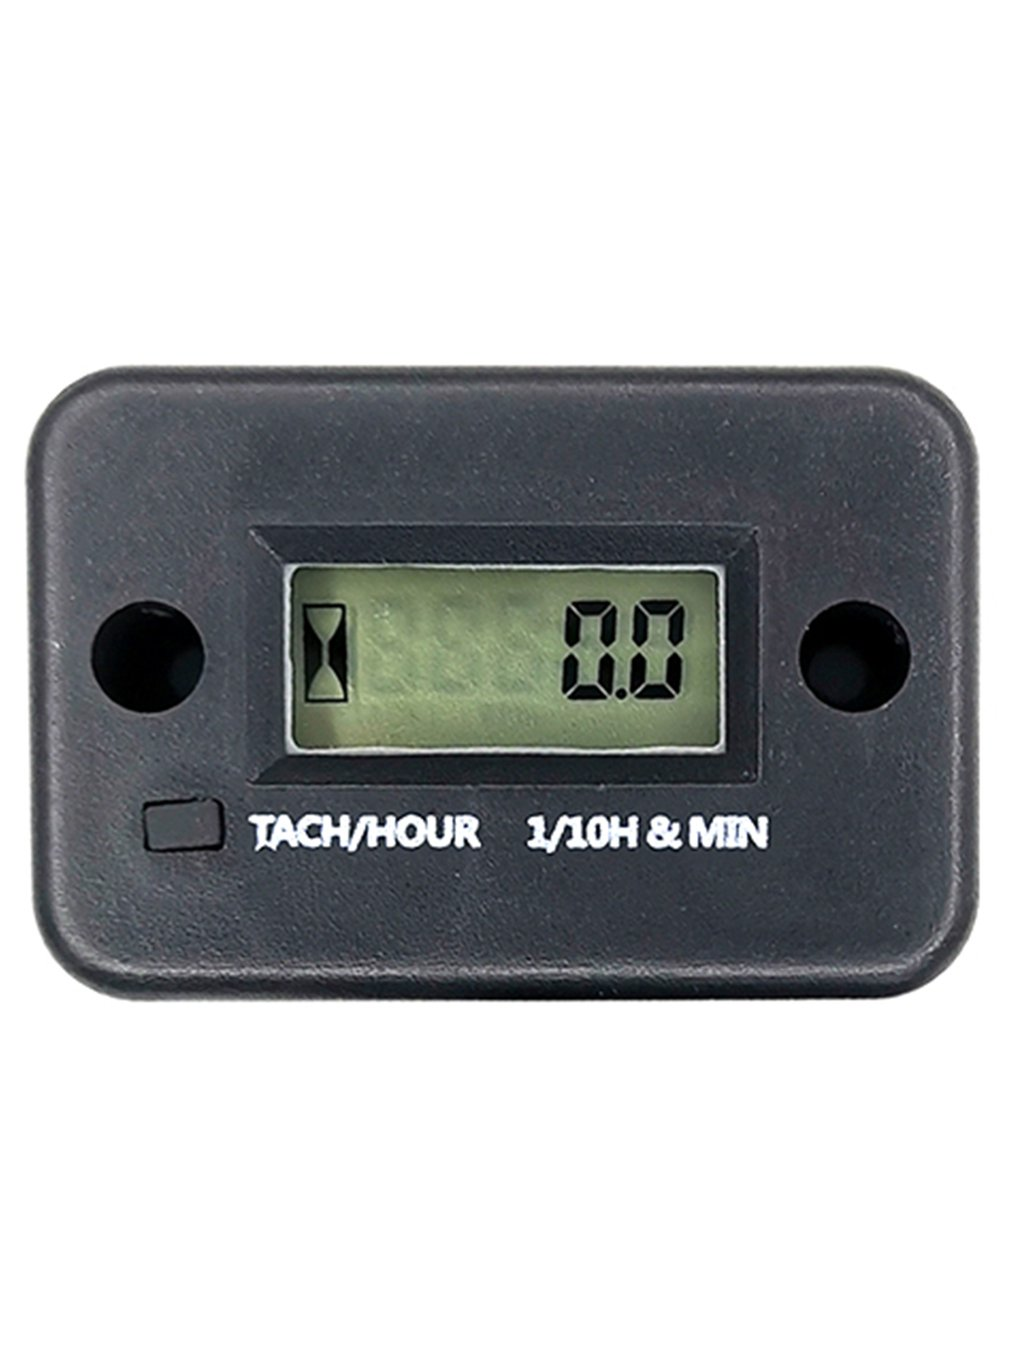 DJ-A03 2 Hour Meter LCD Display Portable Tachometer Timer Chainsaw Tachometer Digital Engine Chronograph